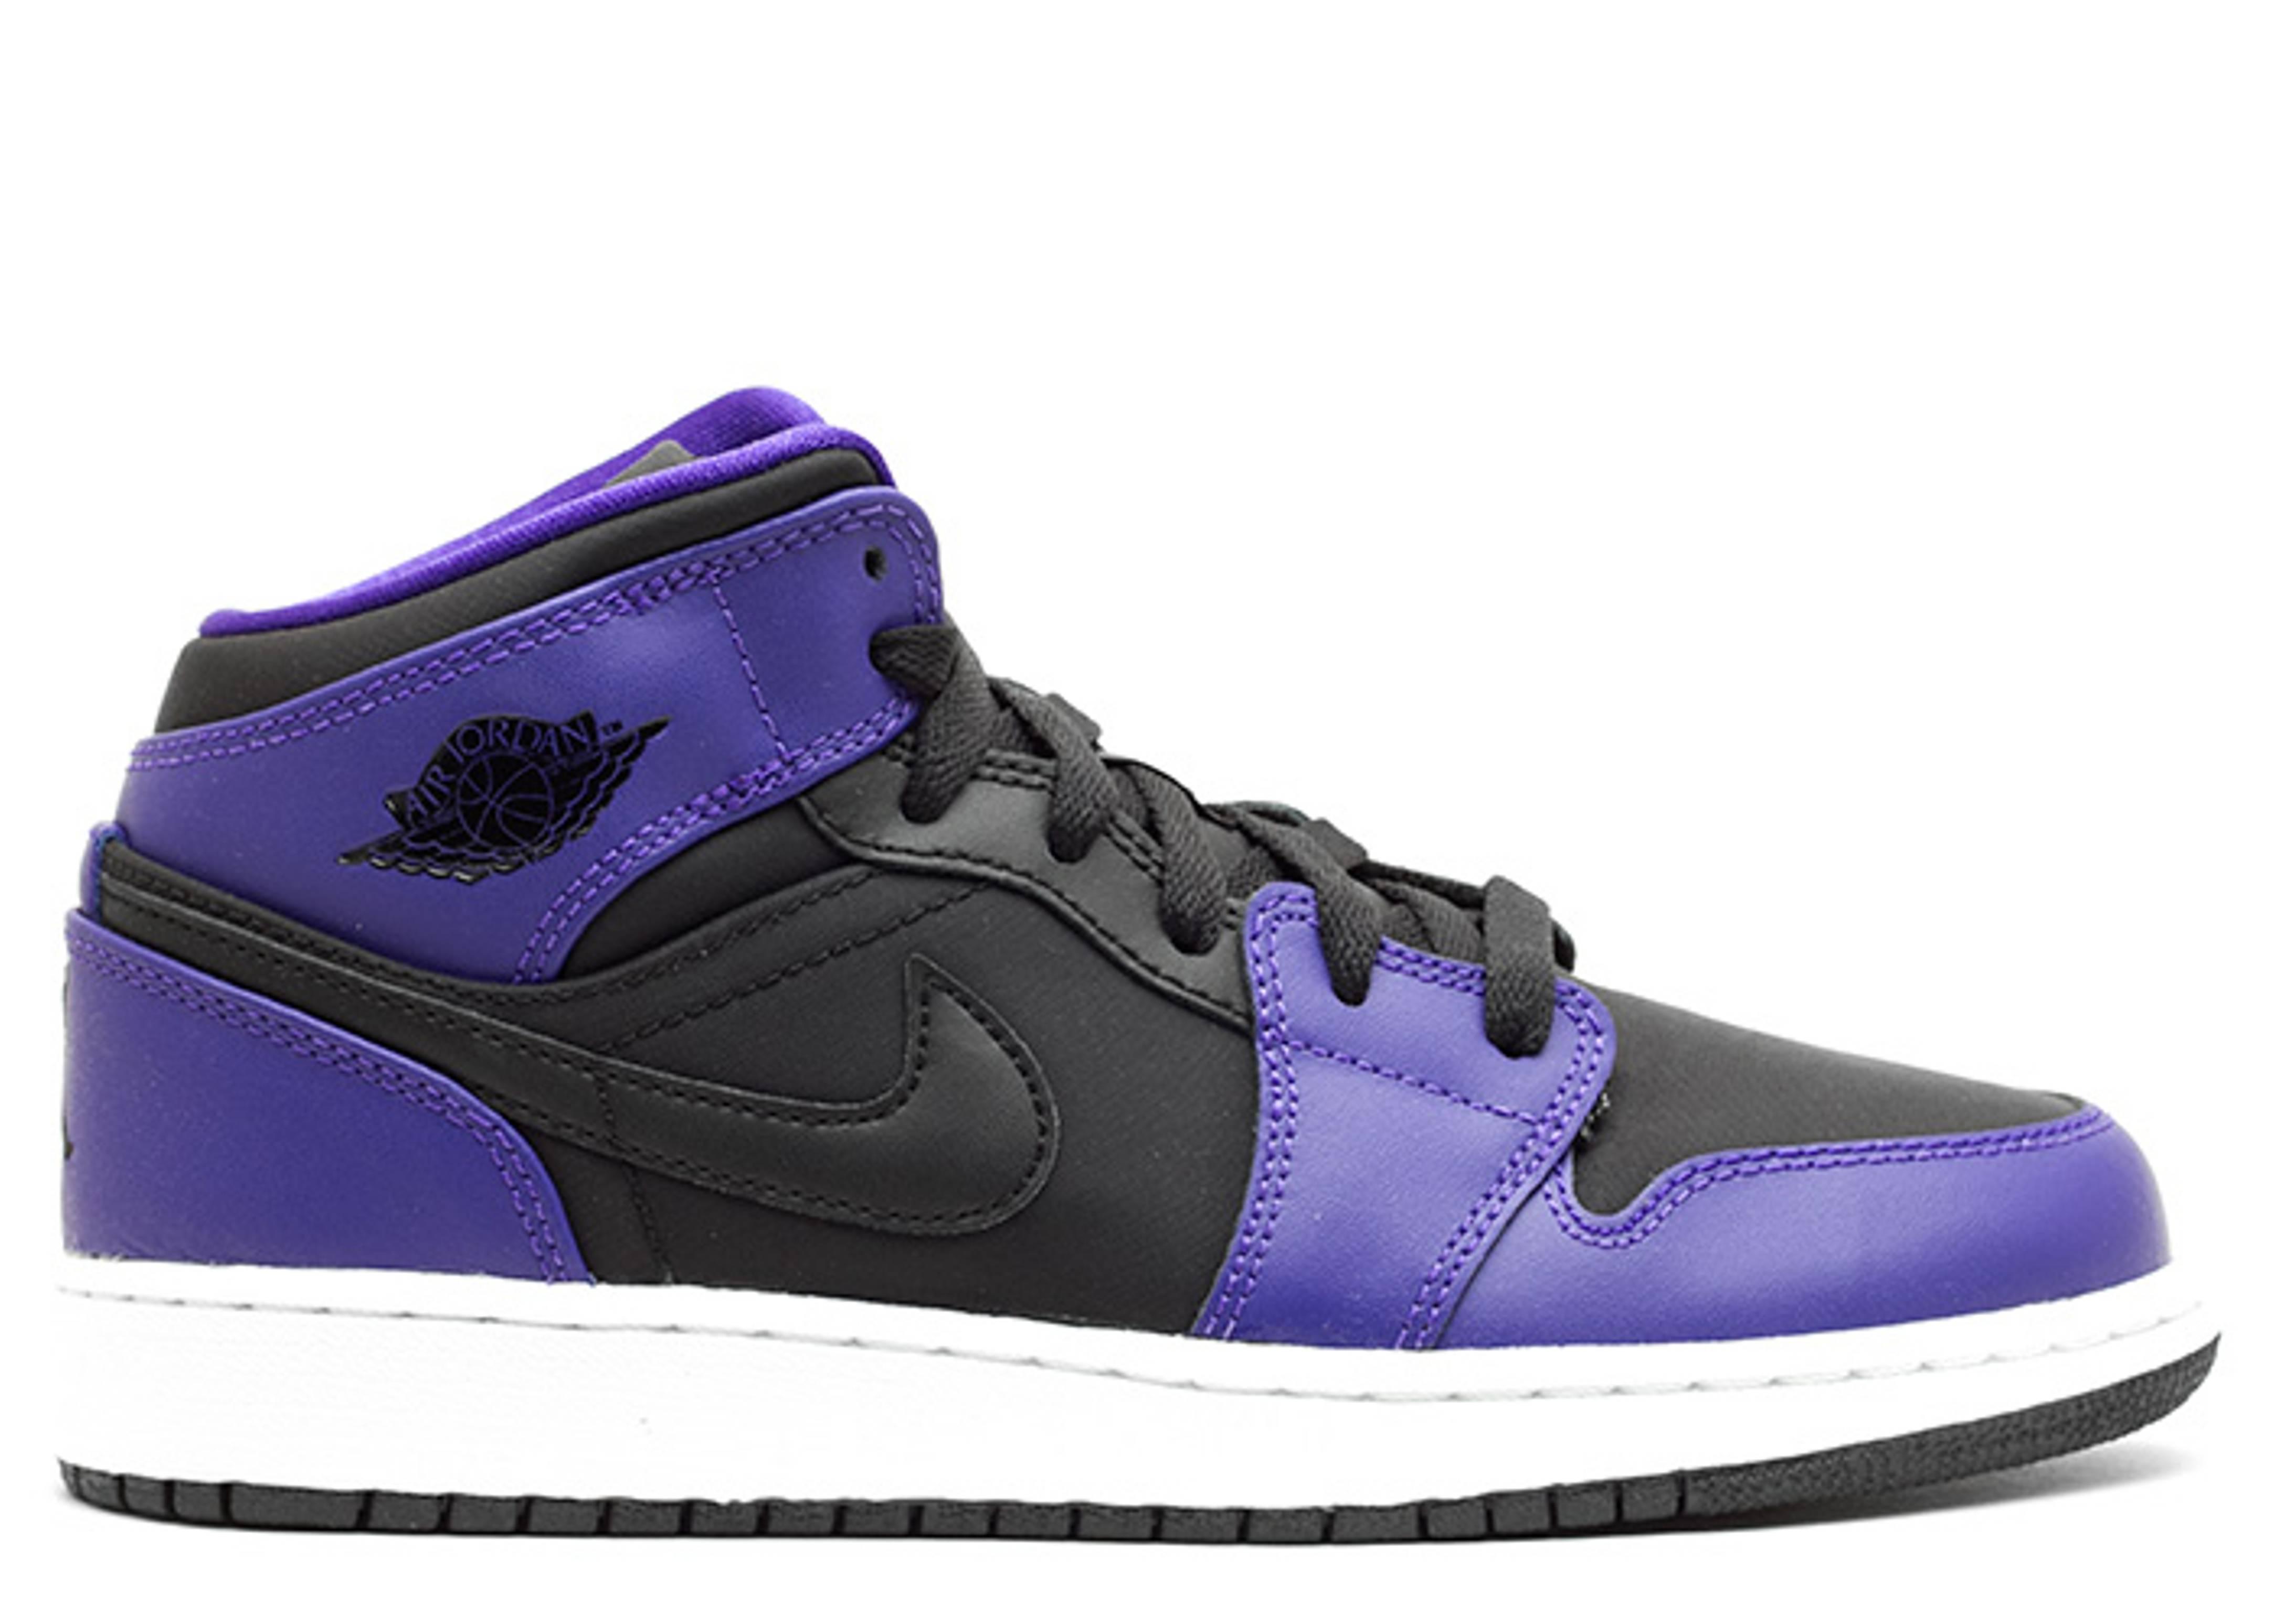 Nike UK Store  Nike Air Jordan 1 Mid Black/Dark Concord Men's Basketball Shoes Size 10.5